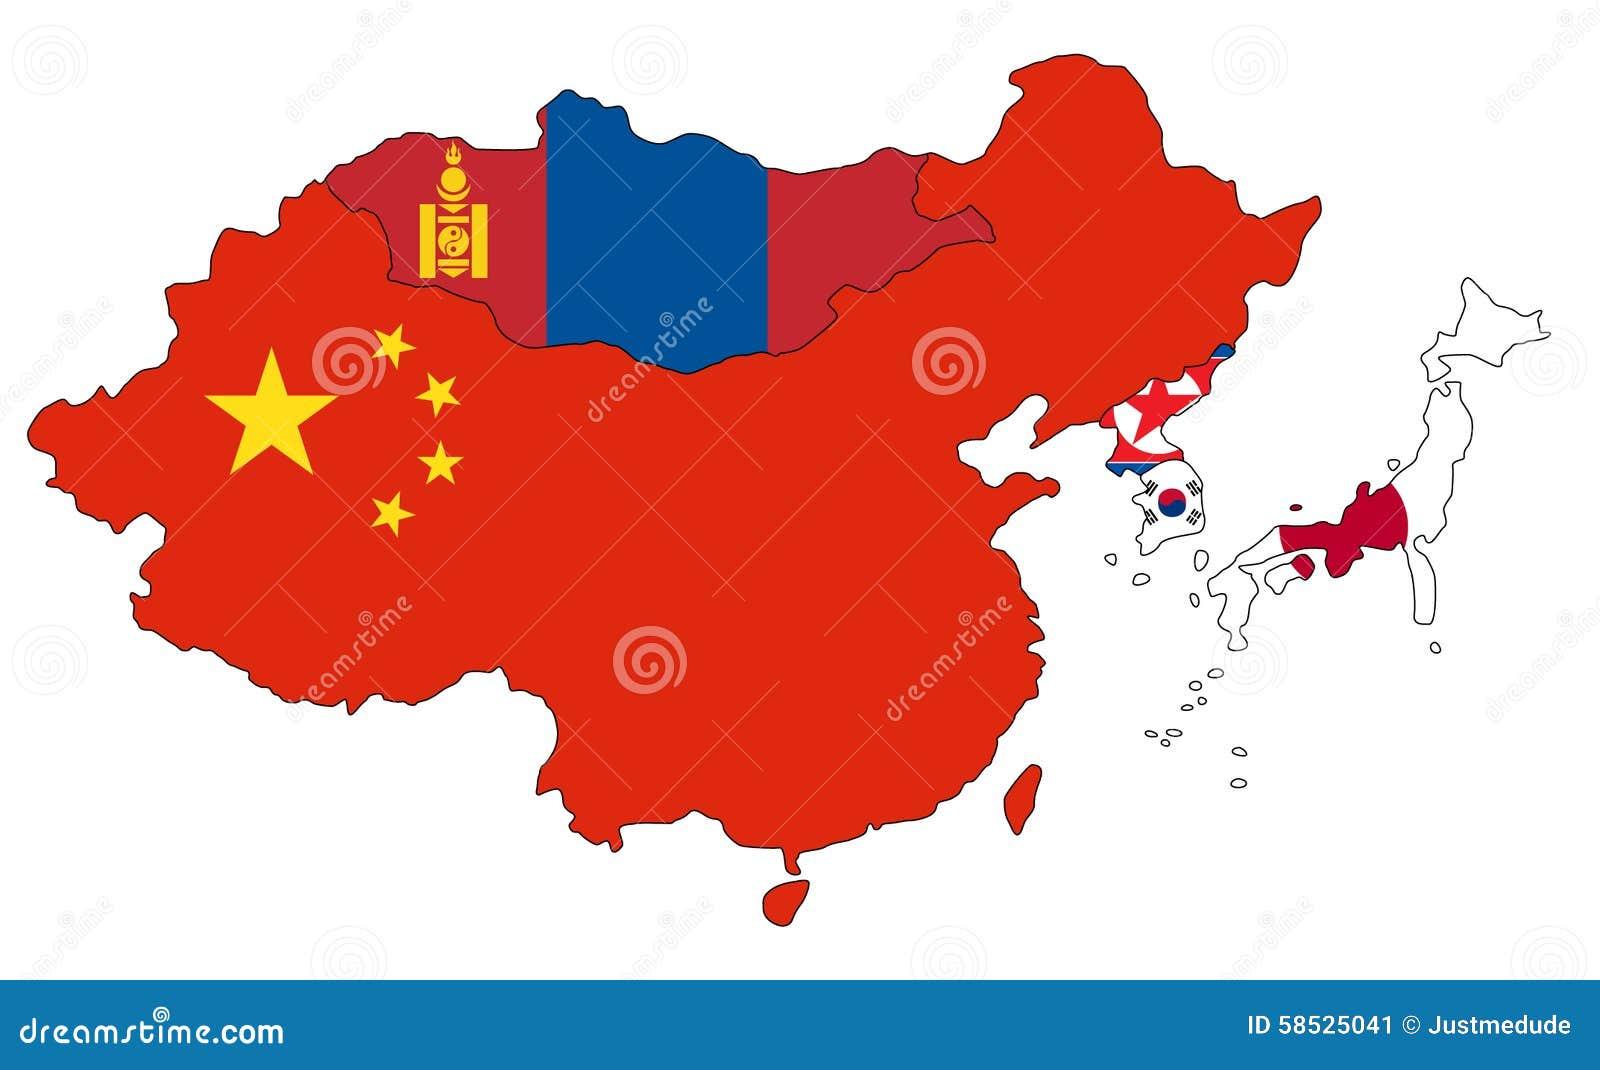 East Asia Map stock illustration. Illustration of national - 58525041